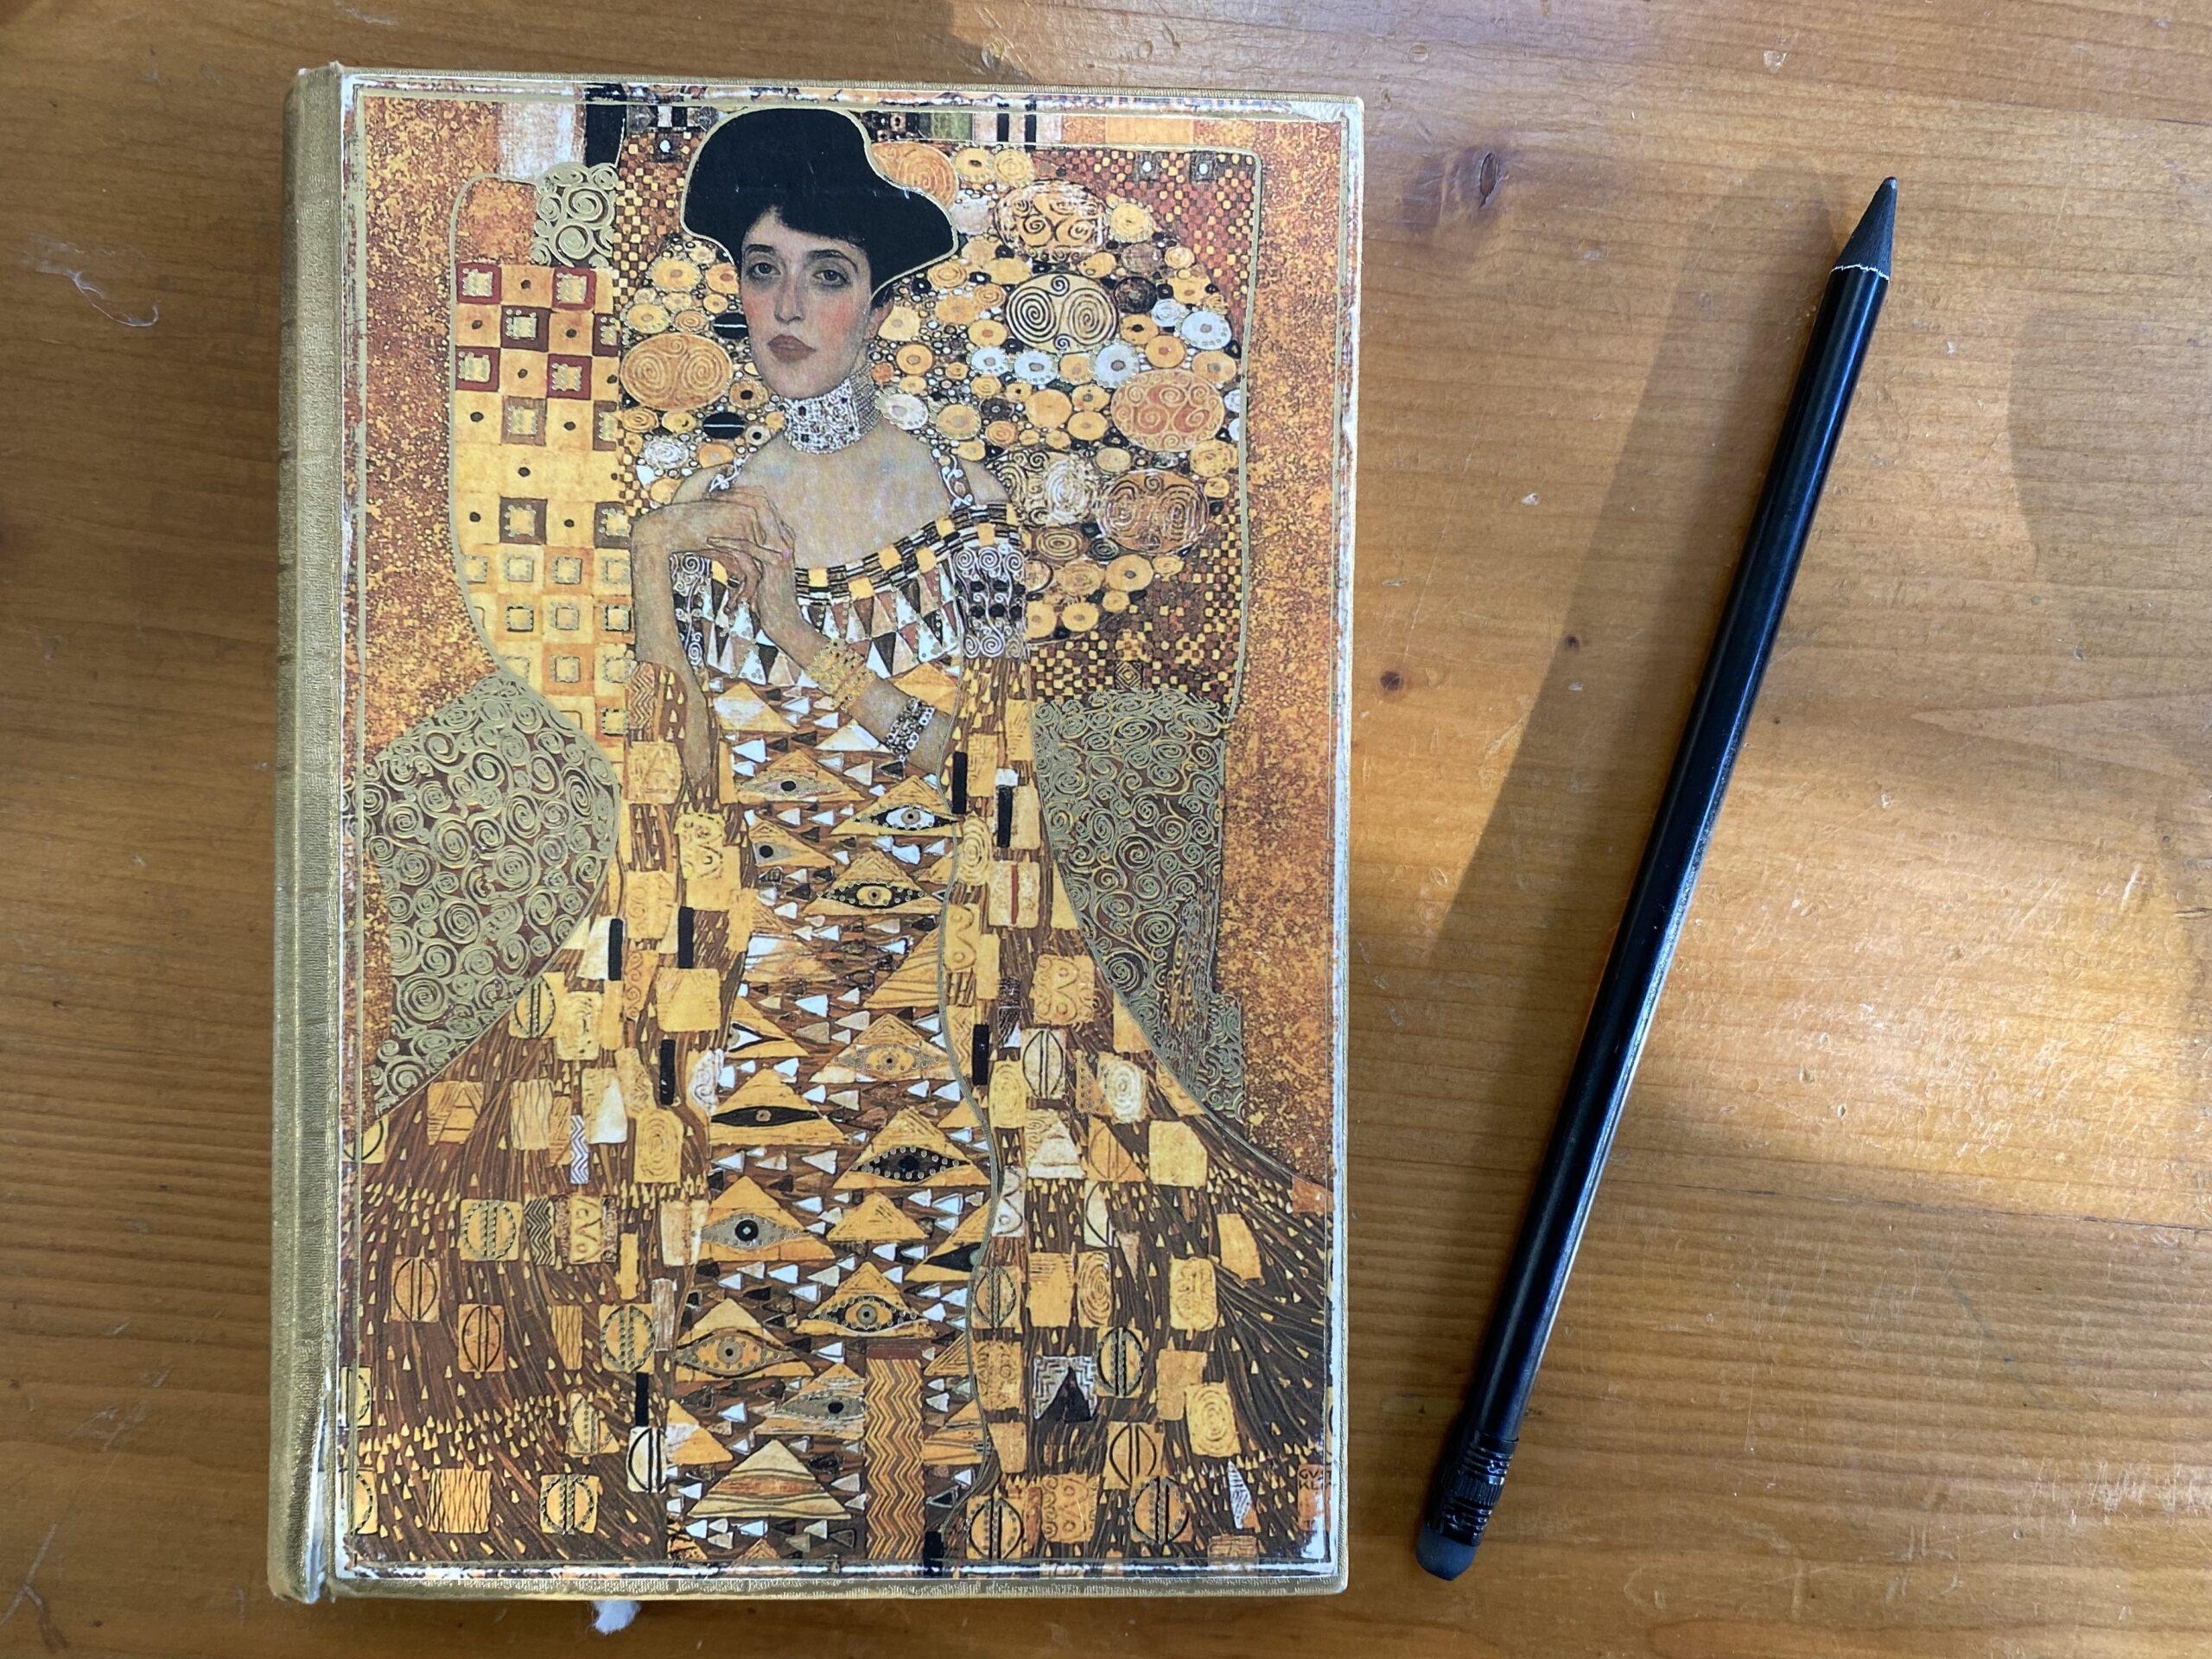 Painting of Gustav Klimt. Portrait of Adele Bloch Bauer